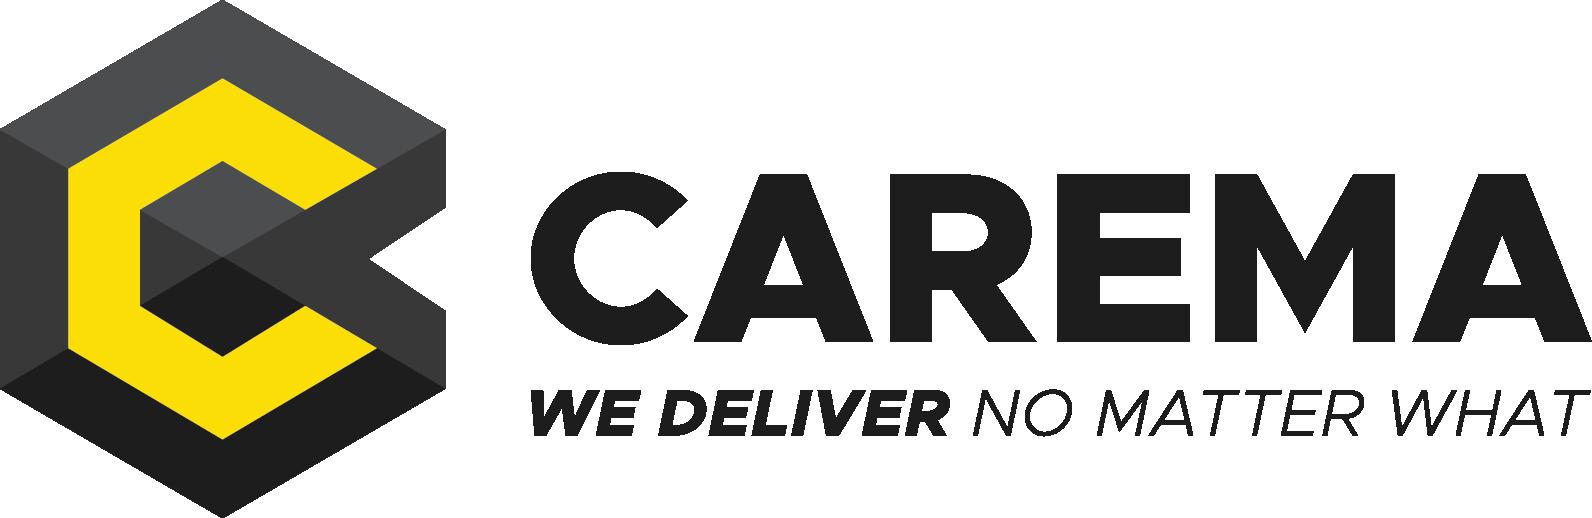 Distributor von Enterprise PDA, Barcode-Scanner, Mobile Drucker & MDE Geräte | CaremaHomepage